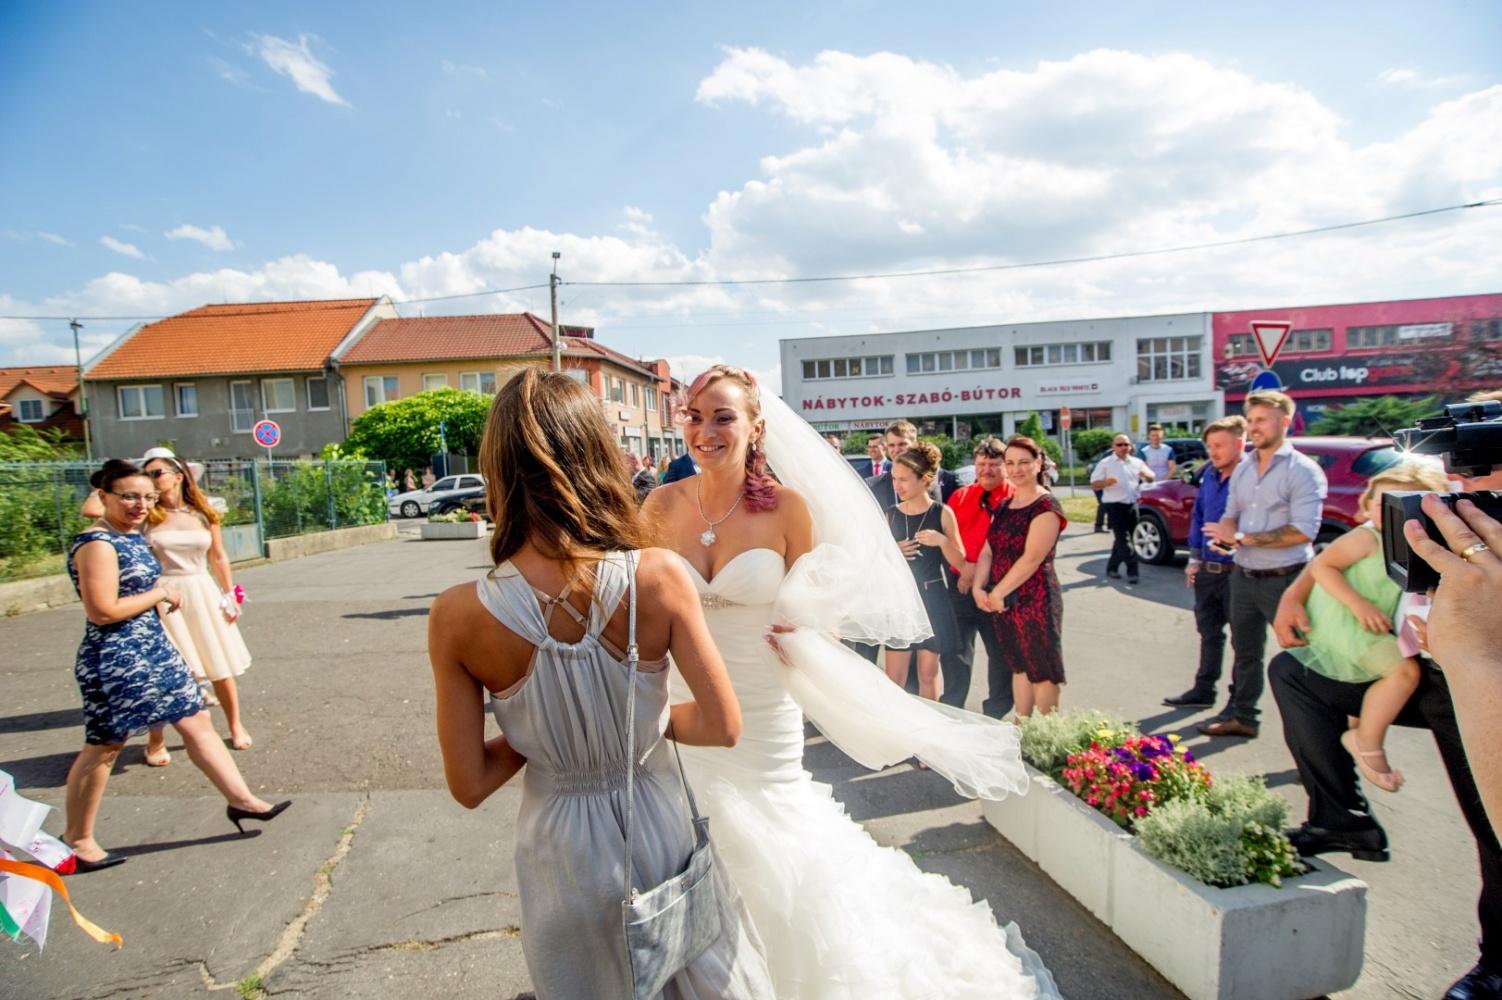 http://www.fotoz.sk/images/gallery-29/normal/eskuvo_vintop-karko_143.jpg